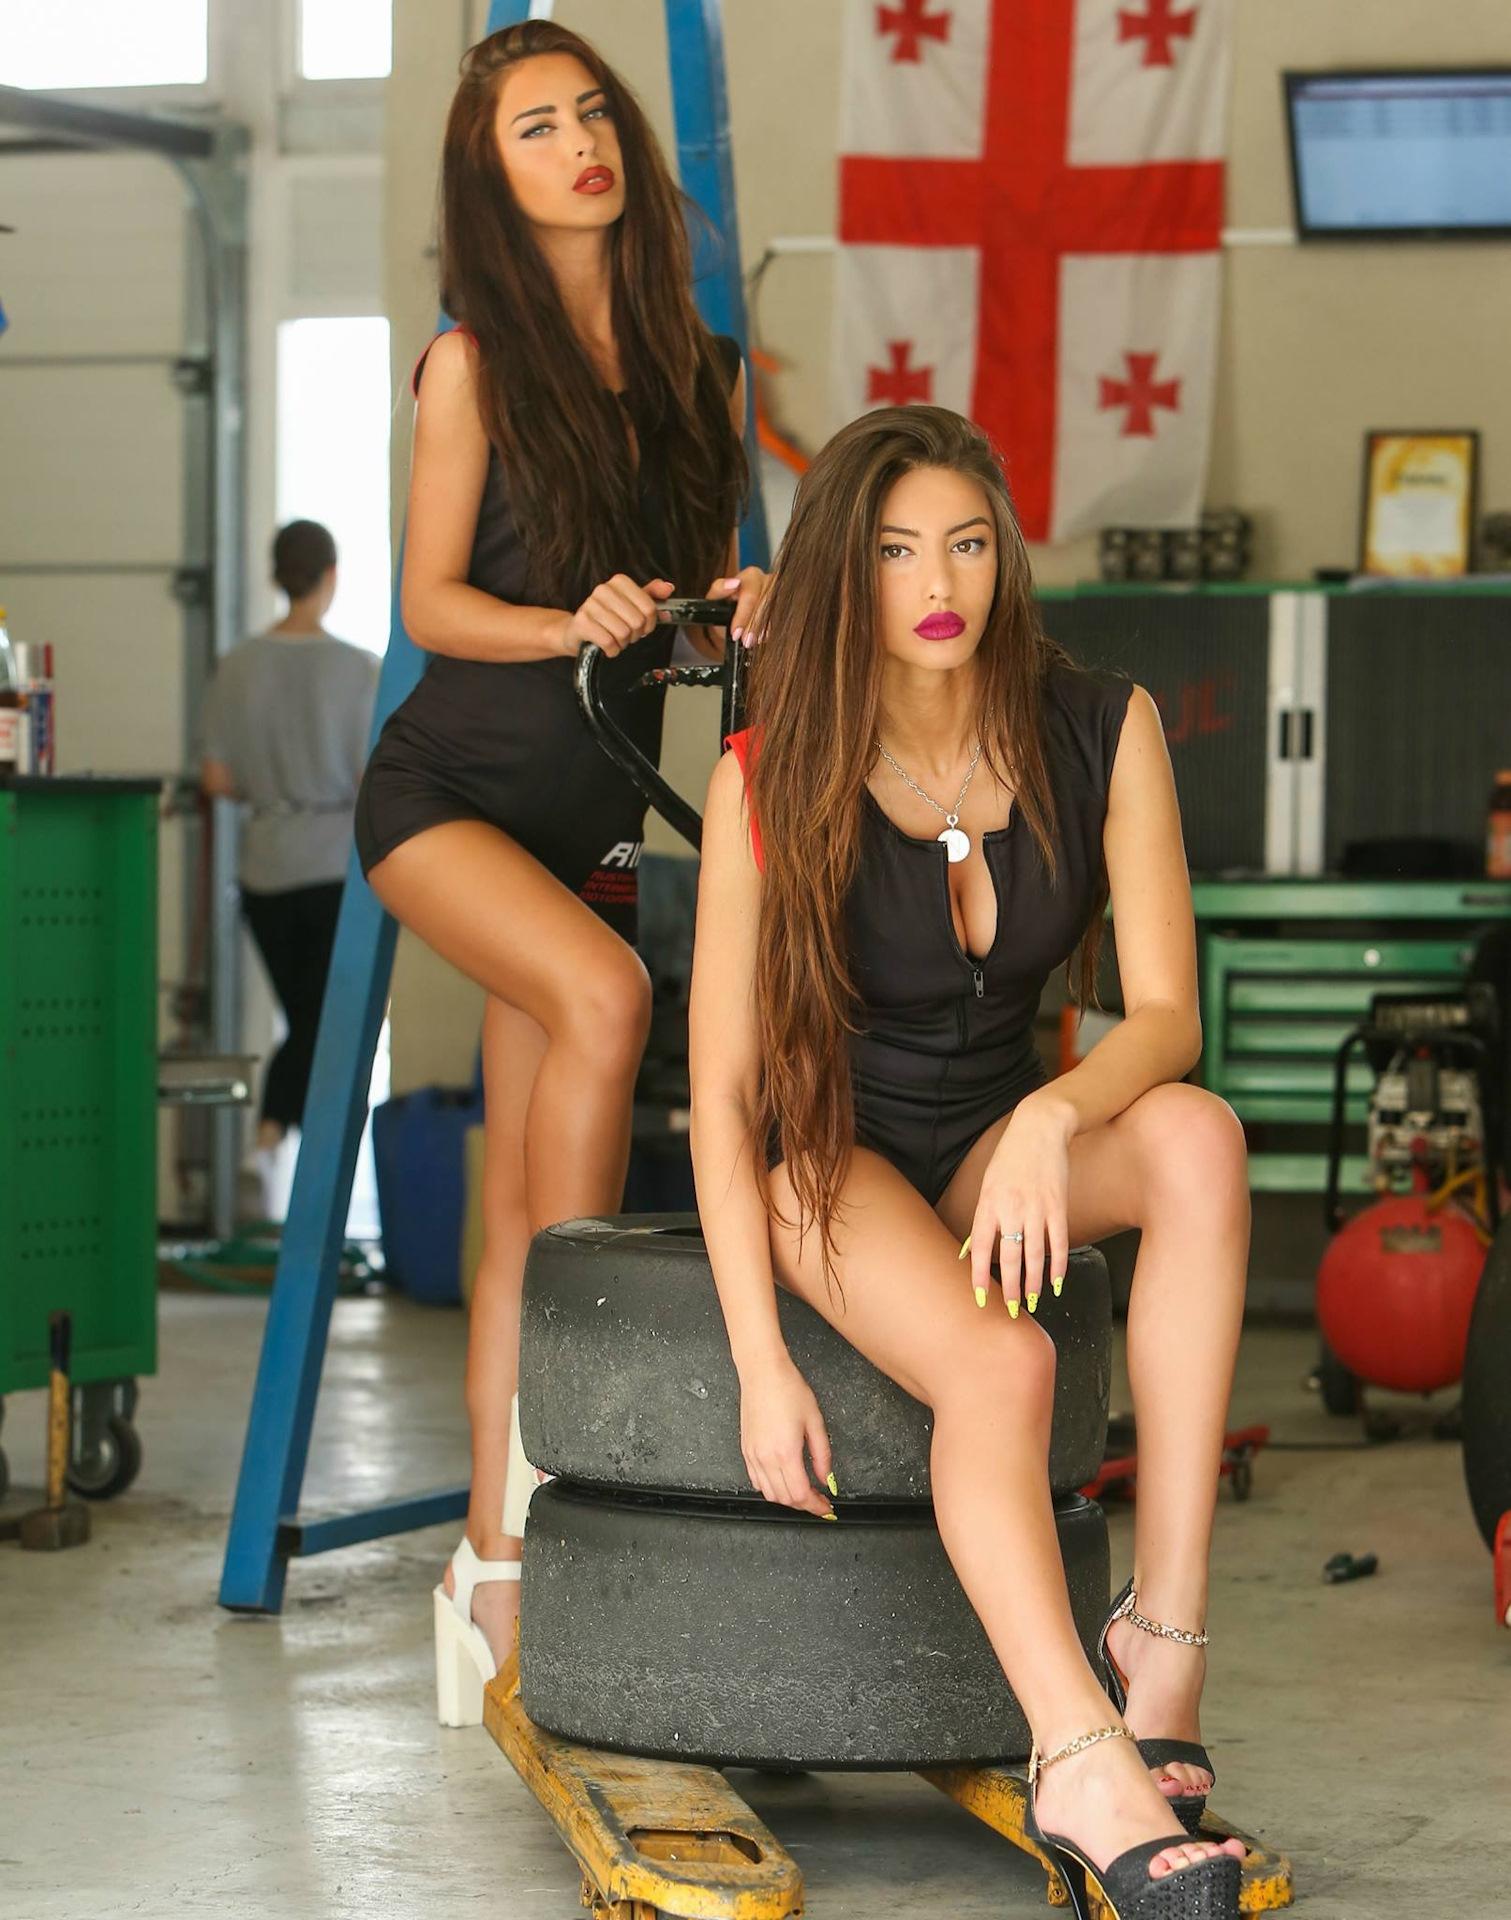 Сексуалние девчонки грузии